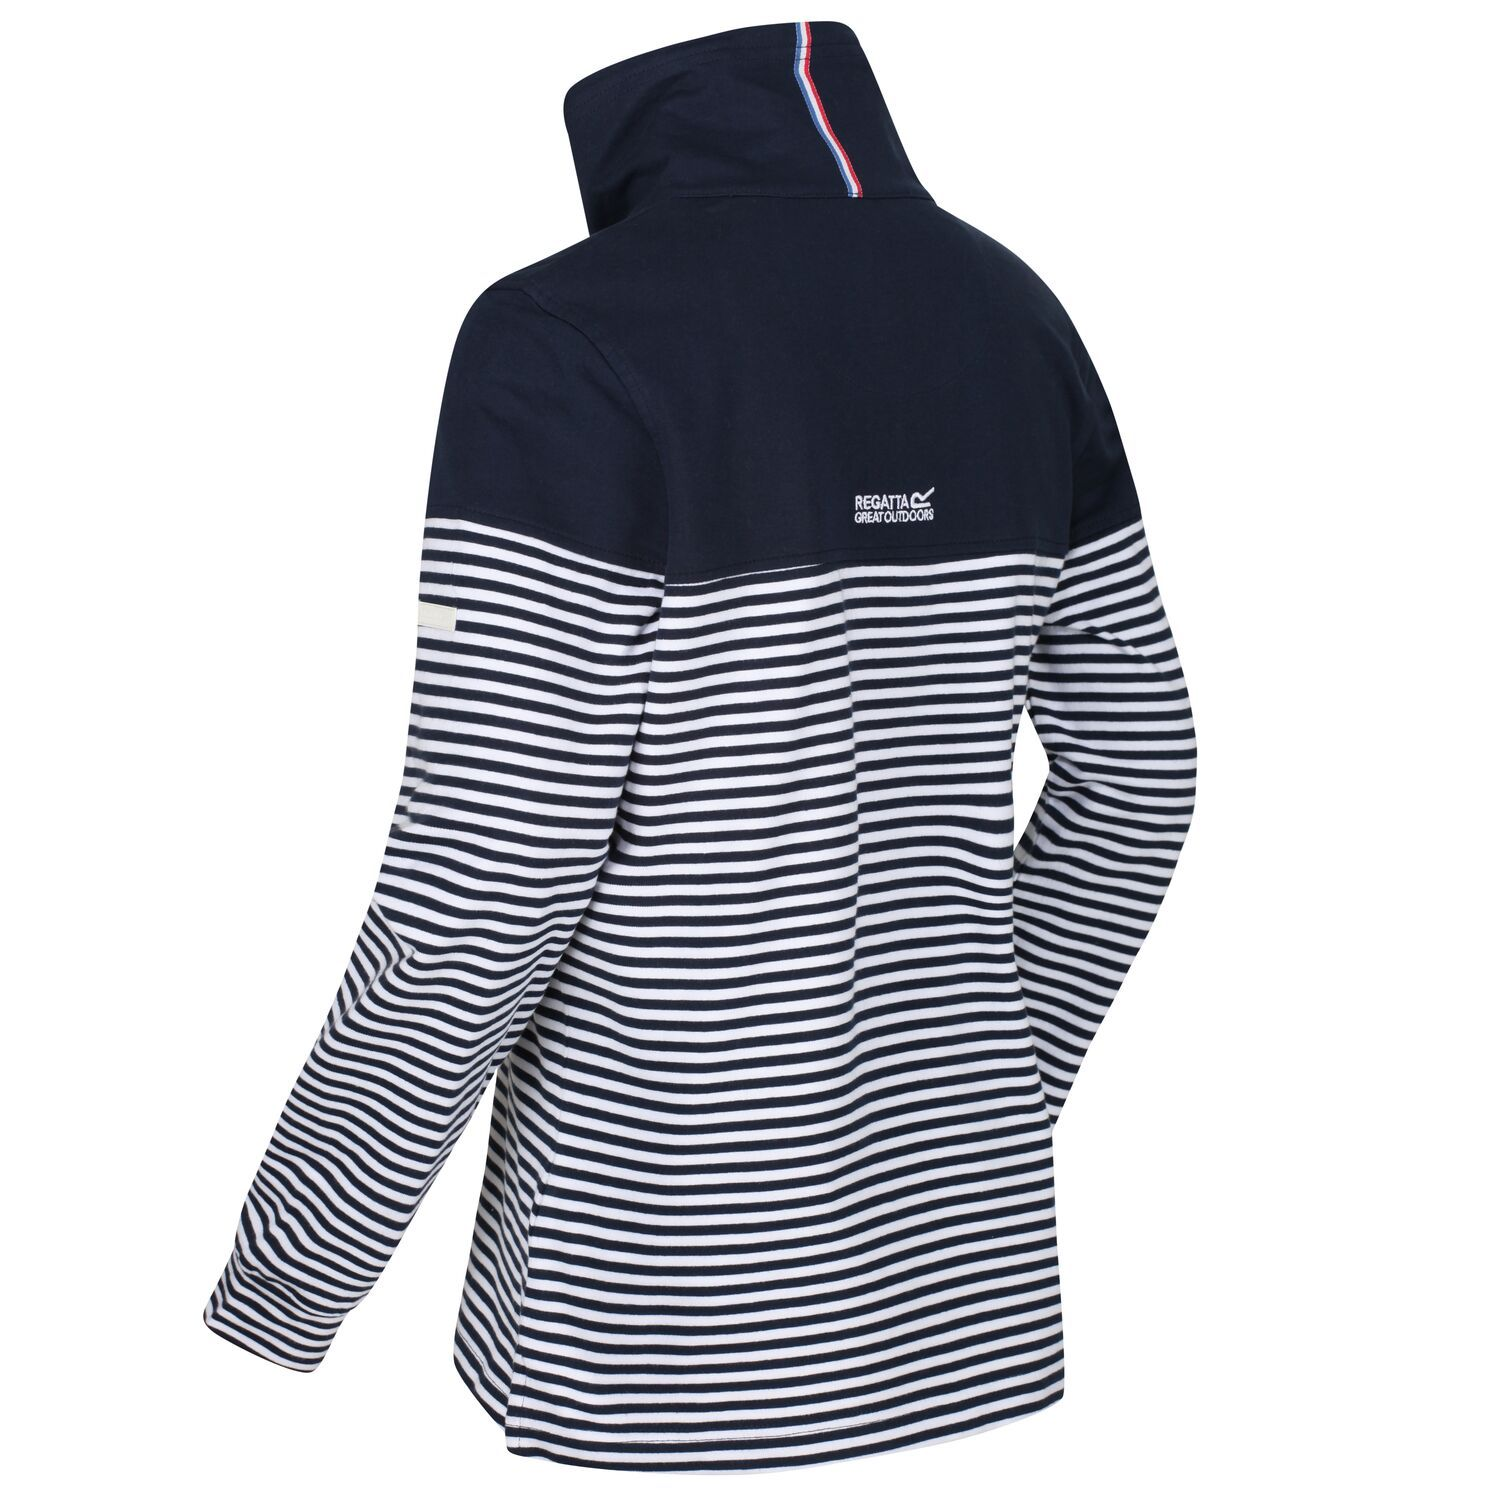 Regatta Womens/Ladies Camiola Funnel Neck Sweater